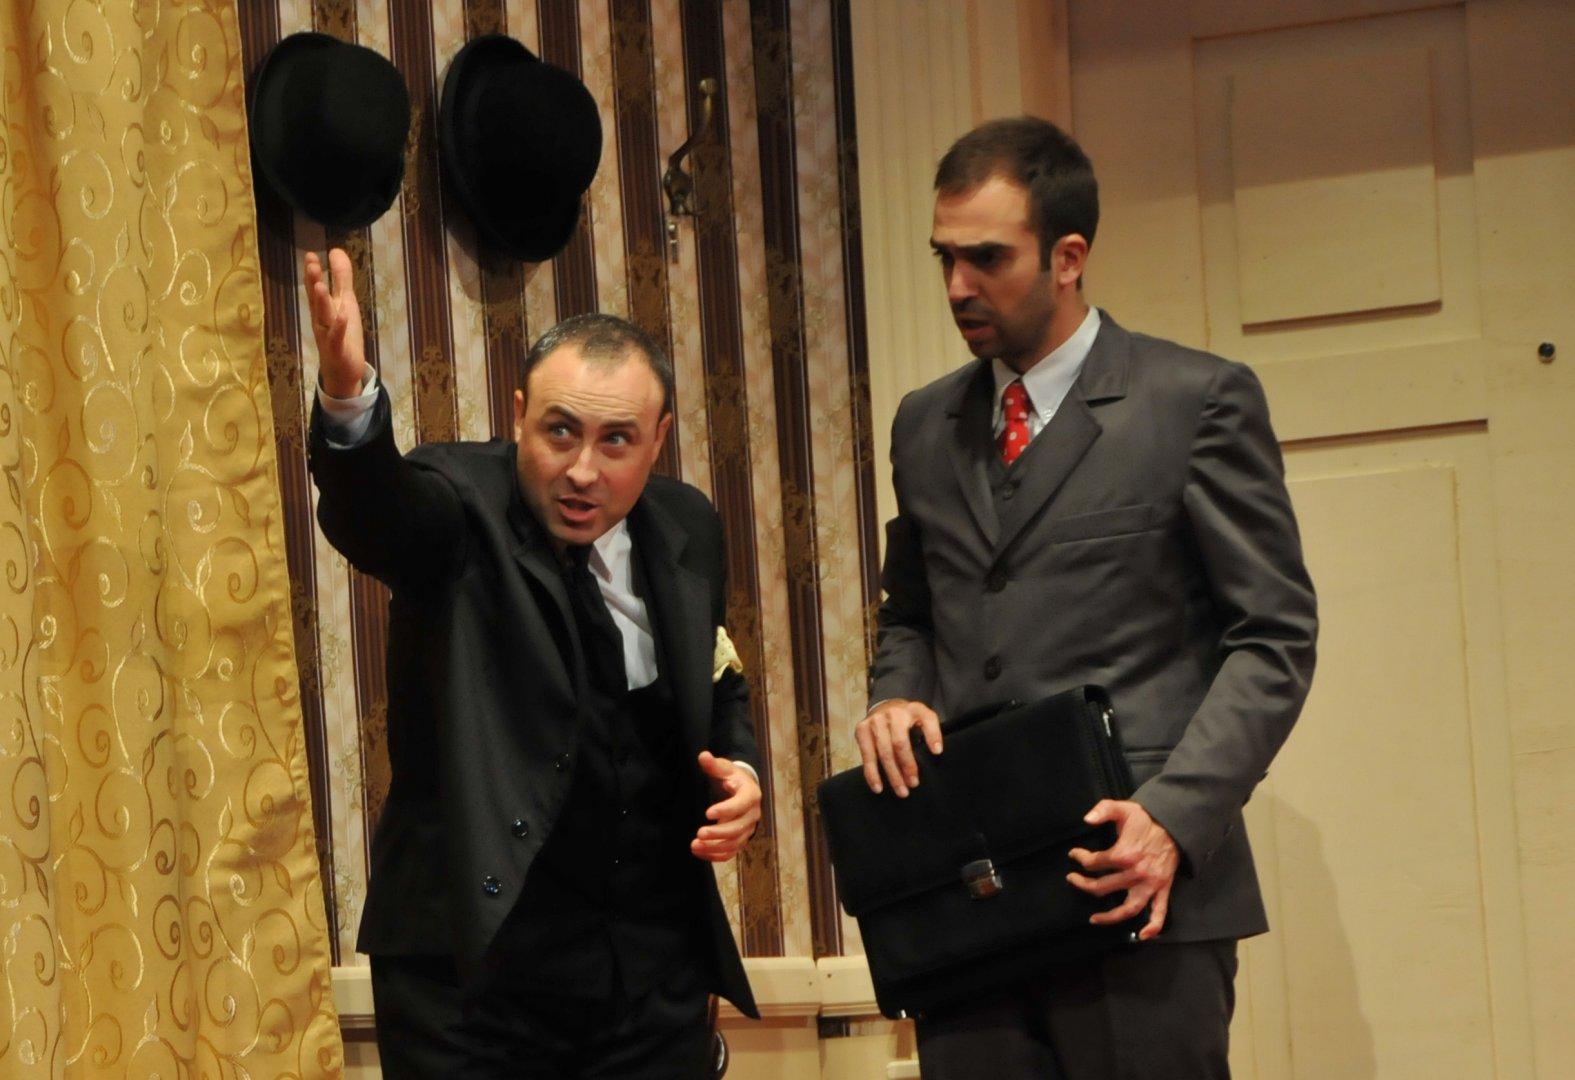 Руслан Мъйнов играе и в Стая1313 в бургаския театър. Снимка Лина Главинова